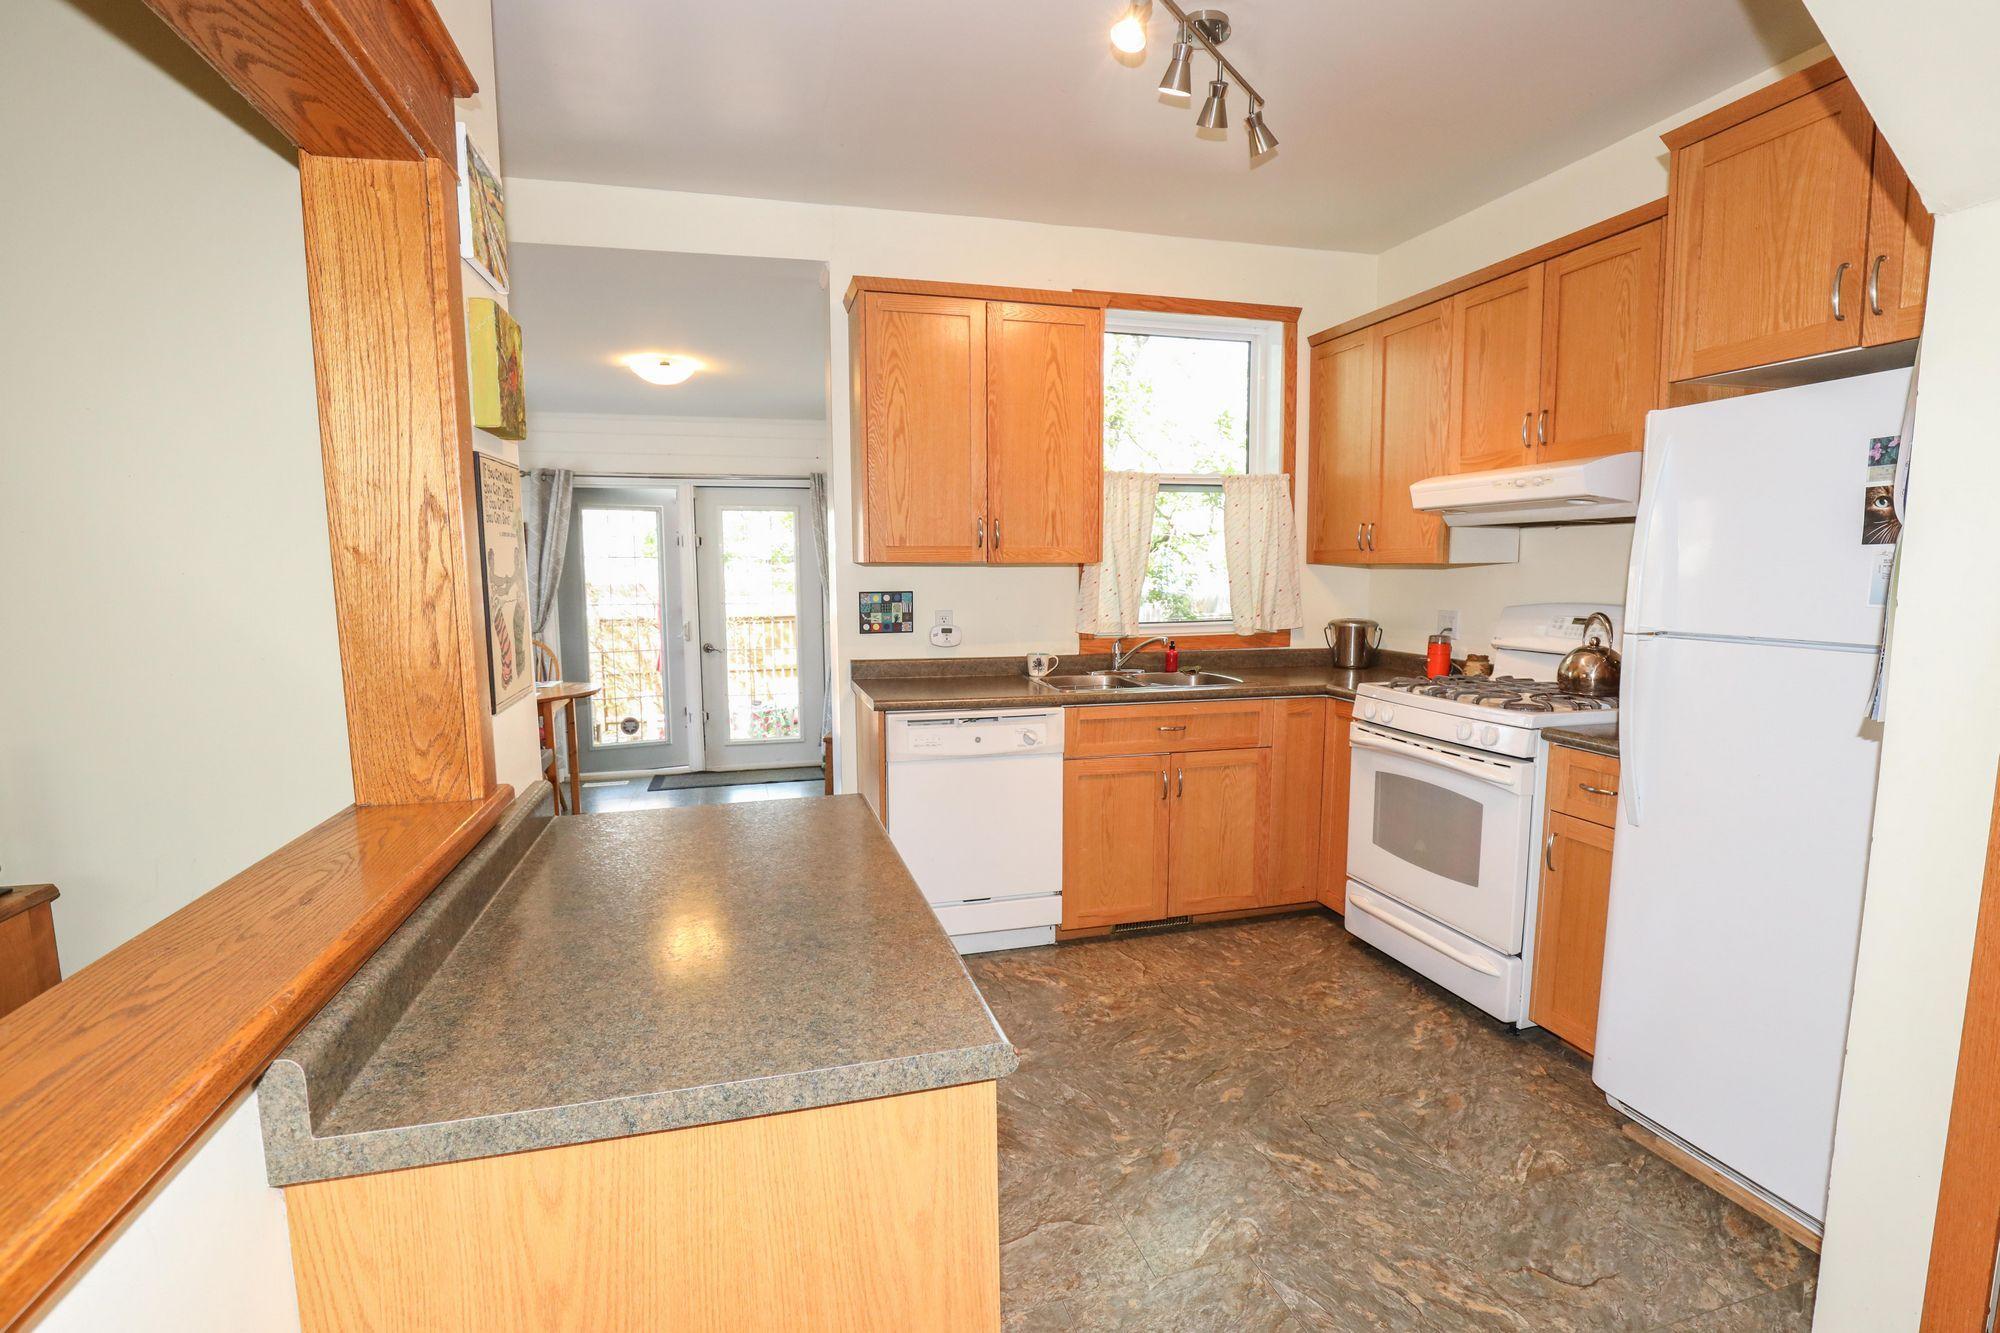 Photo 13: Photos: 110 Lipton in Winnipeg: Wolseley Single Family Detached for sale (5B)  : MLS®# 202111593